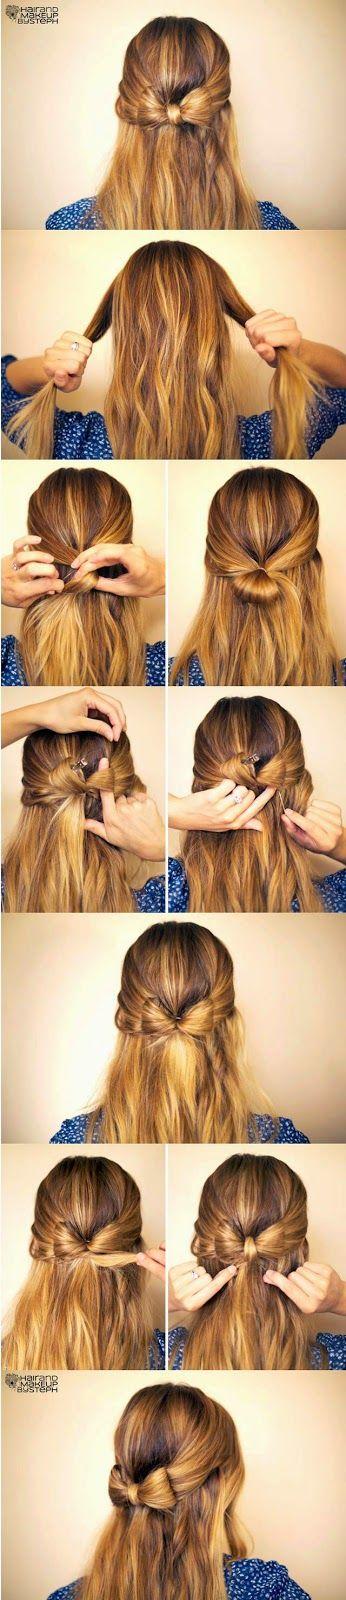 Strange 1000 Ideas About Diy Hairstyles On Pinterest Easy Diy Hairstyles For Women Draintrainus